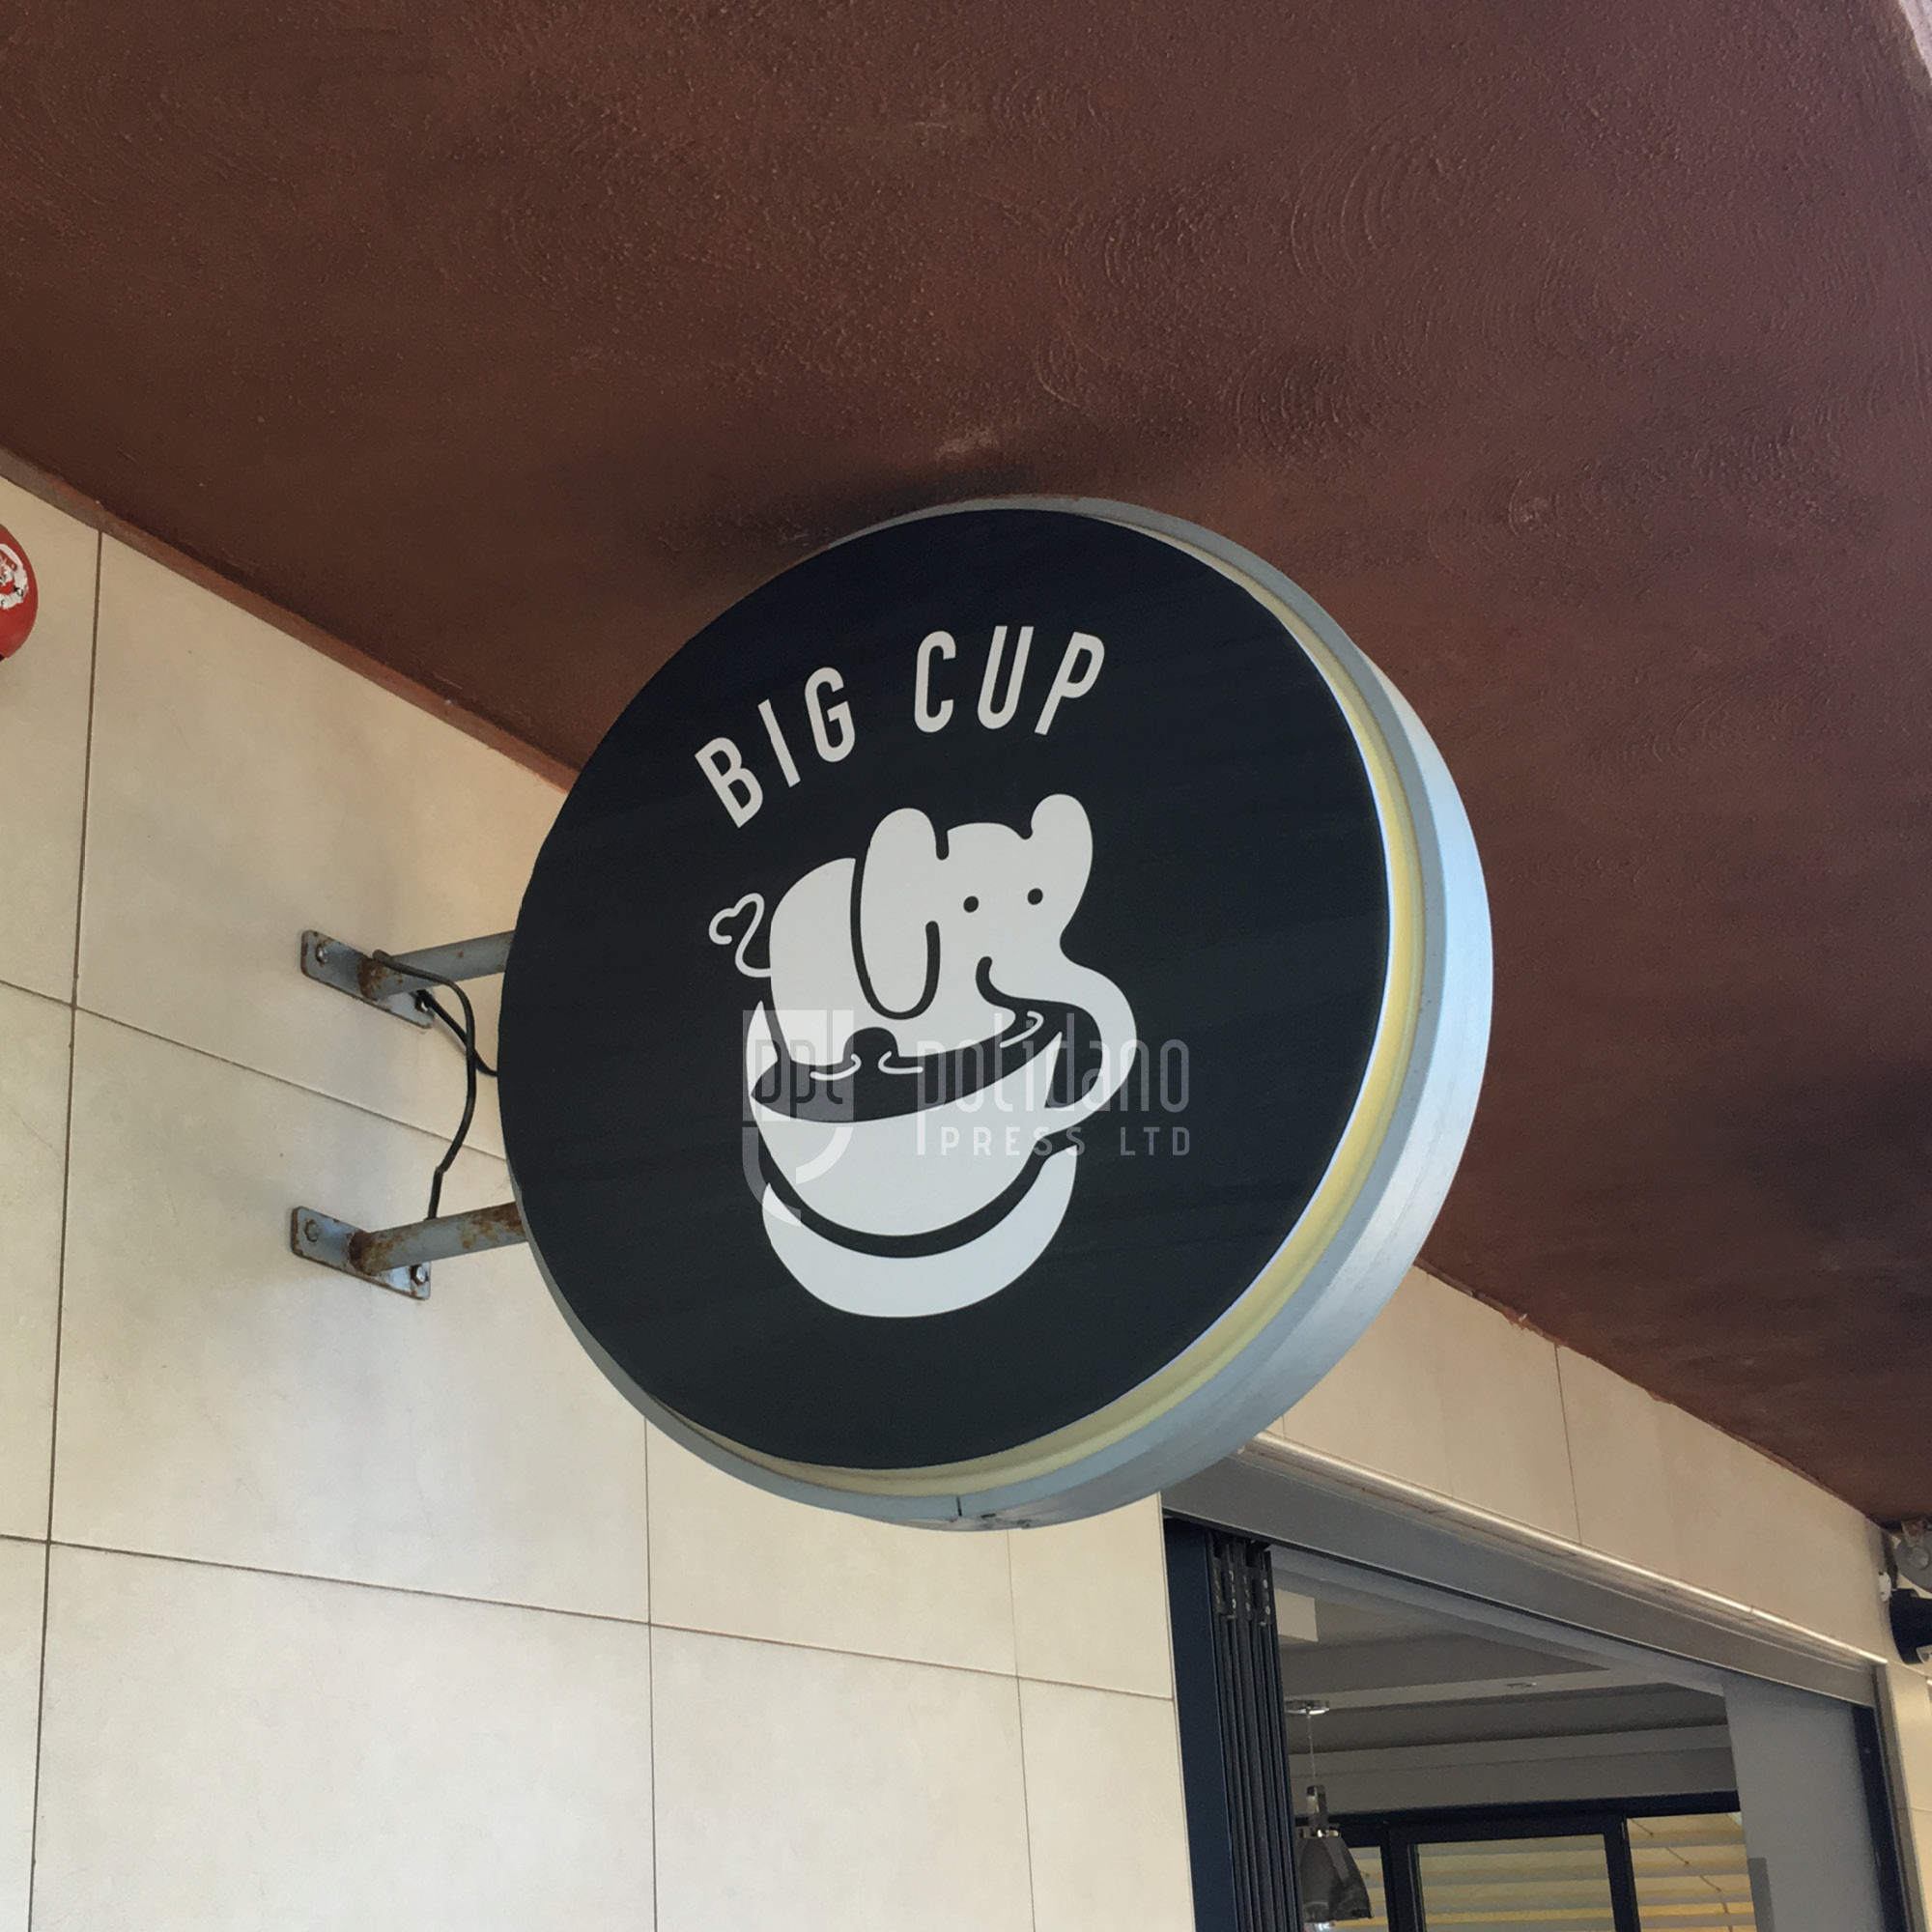 Big Cup Signage